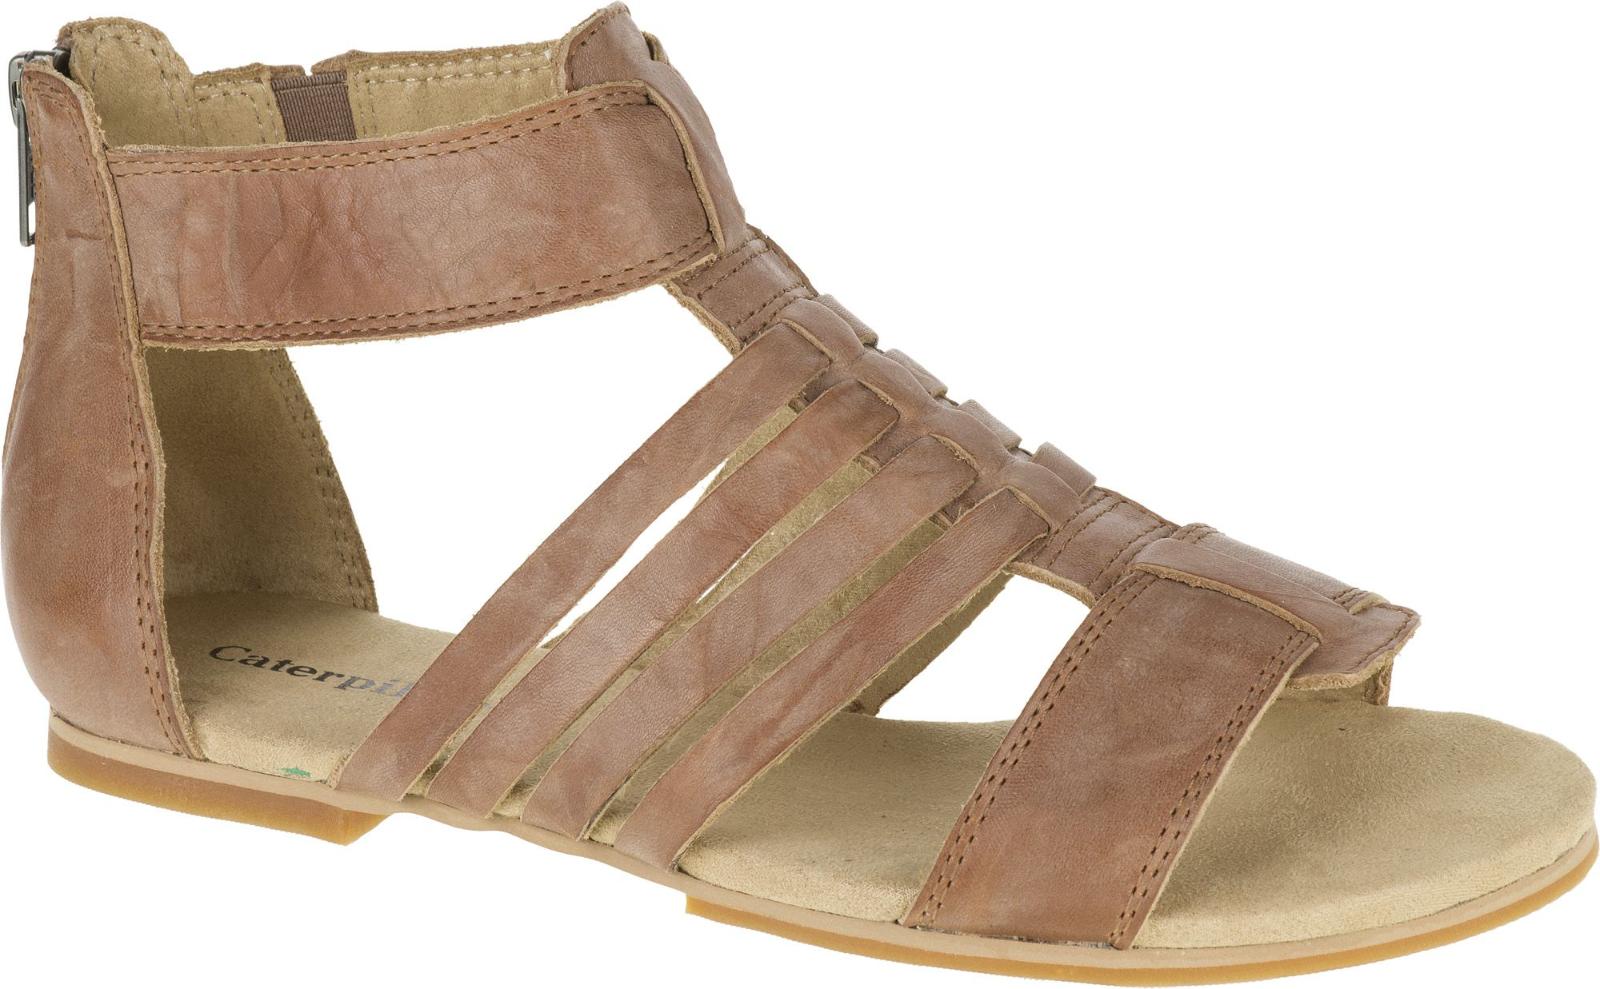 Para Mujeres Calzado Cat Tanga Sandalia Marrón Talla 8.5 8.5 8.5  NIG50-315  Garantía 100% de ajuste